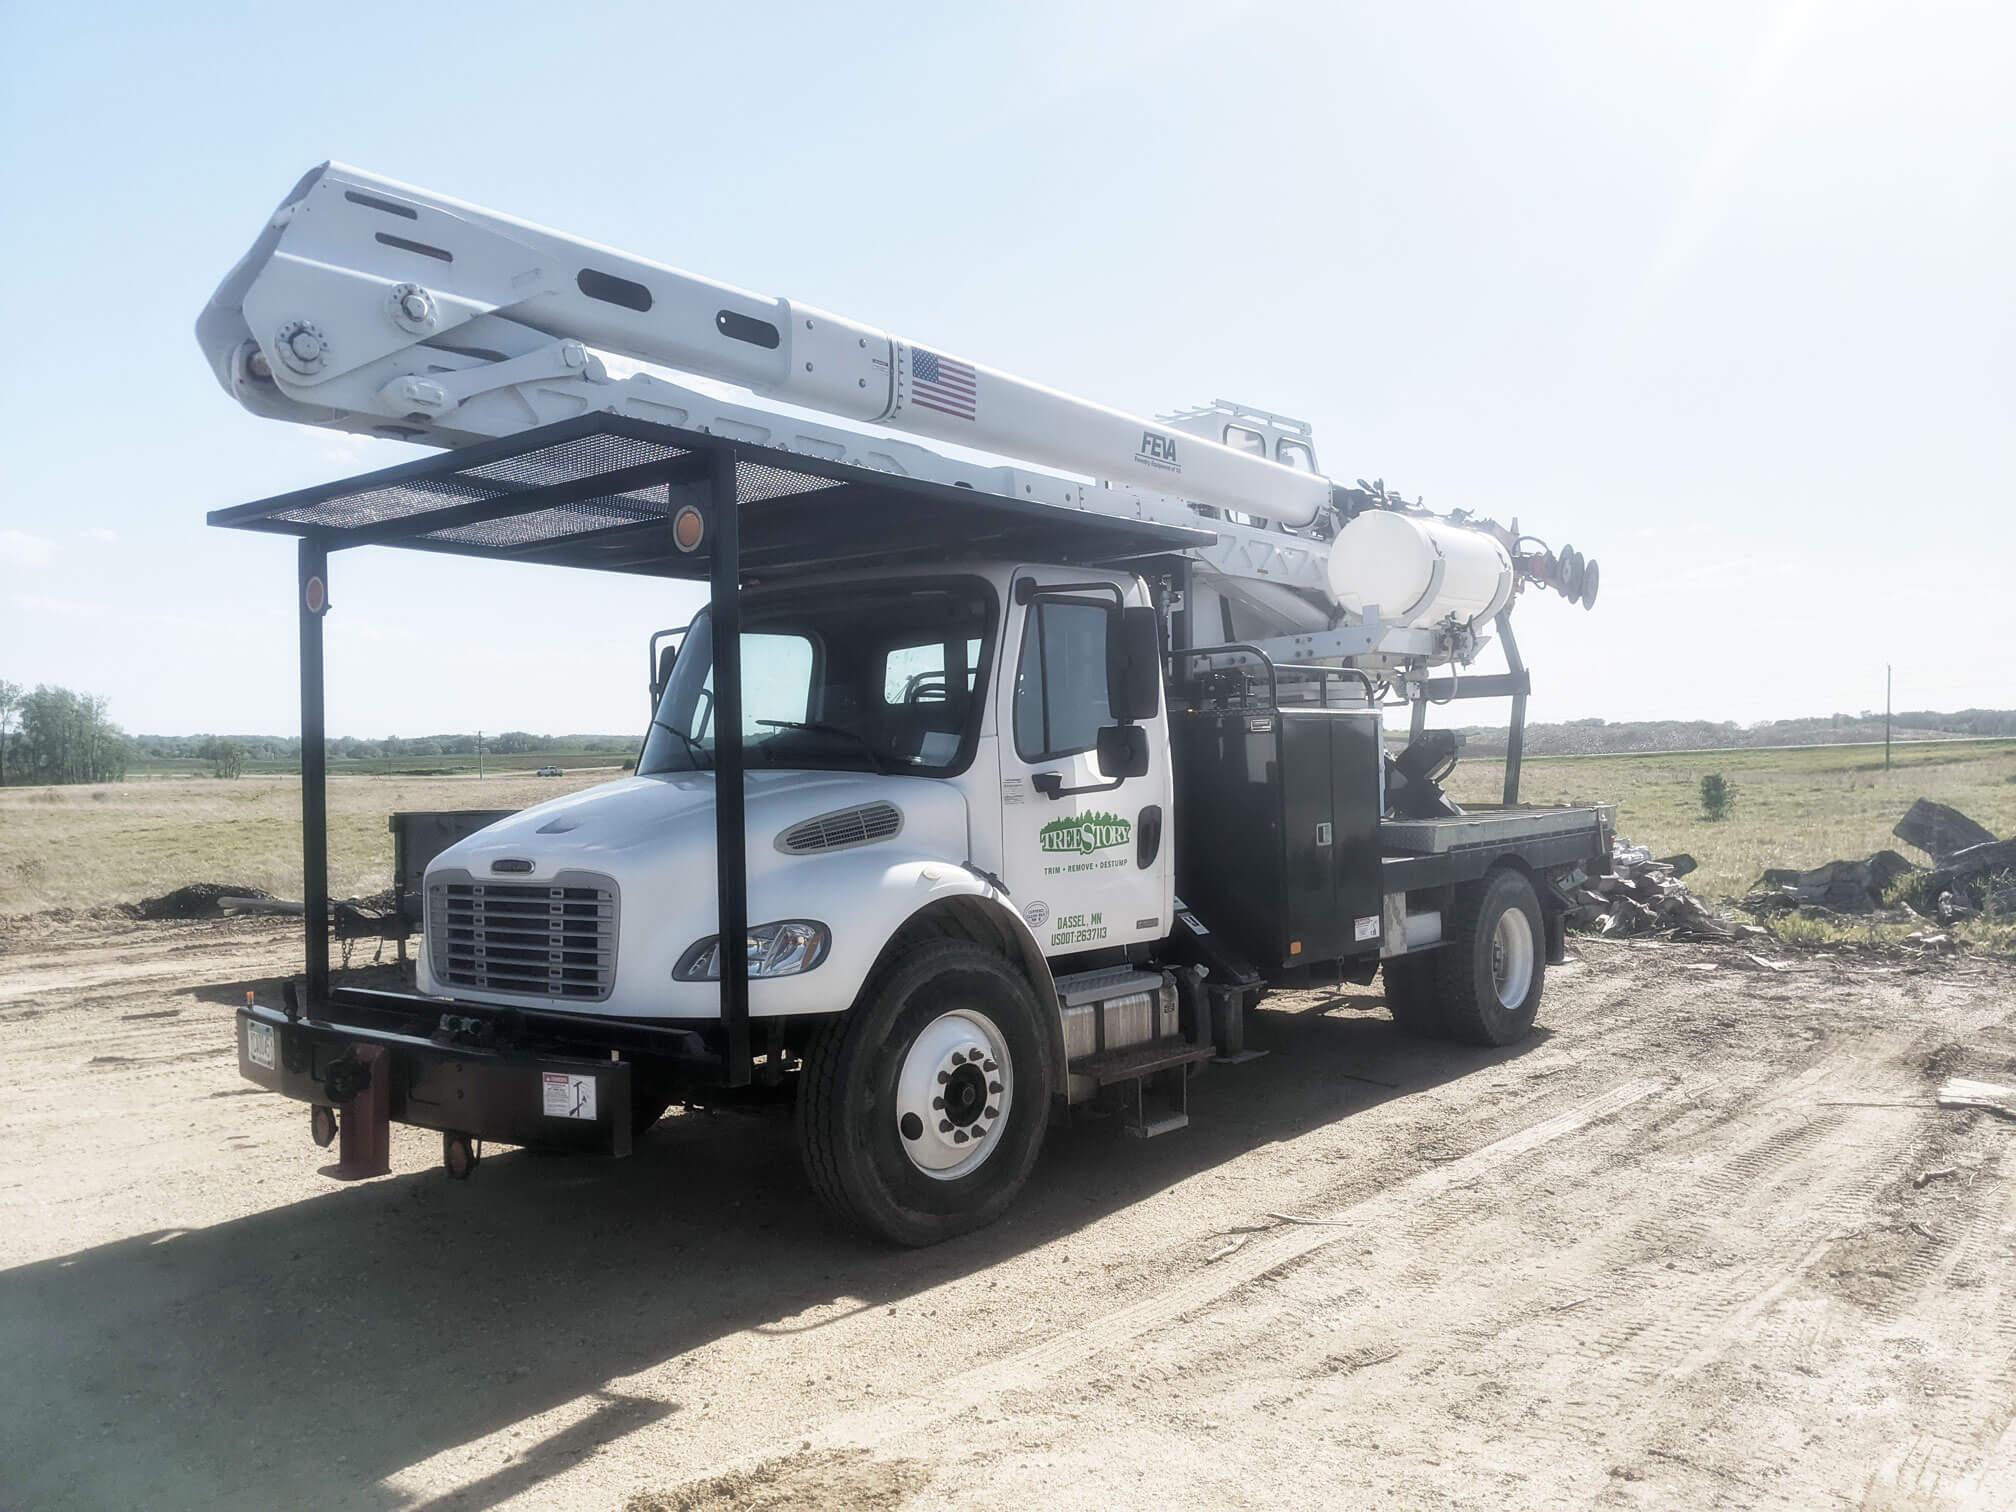 Terra Tech Treemaster truck in white sitting on an empty gravel lot. Commercial heavy-duty machinery for tree maintenance